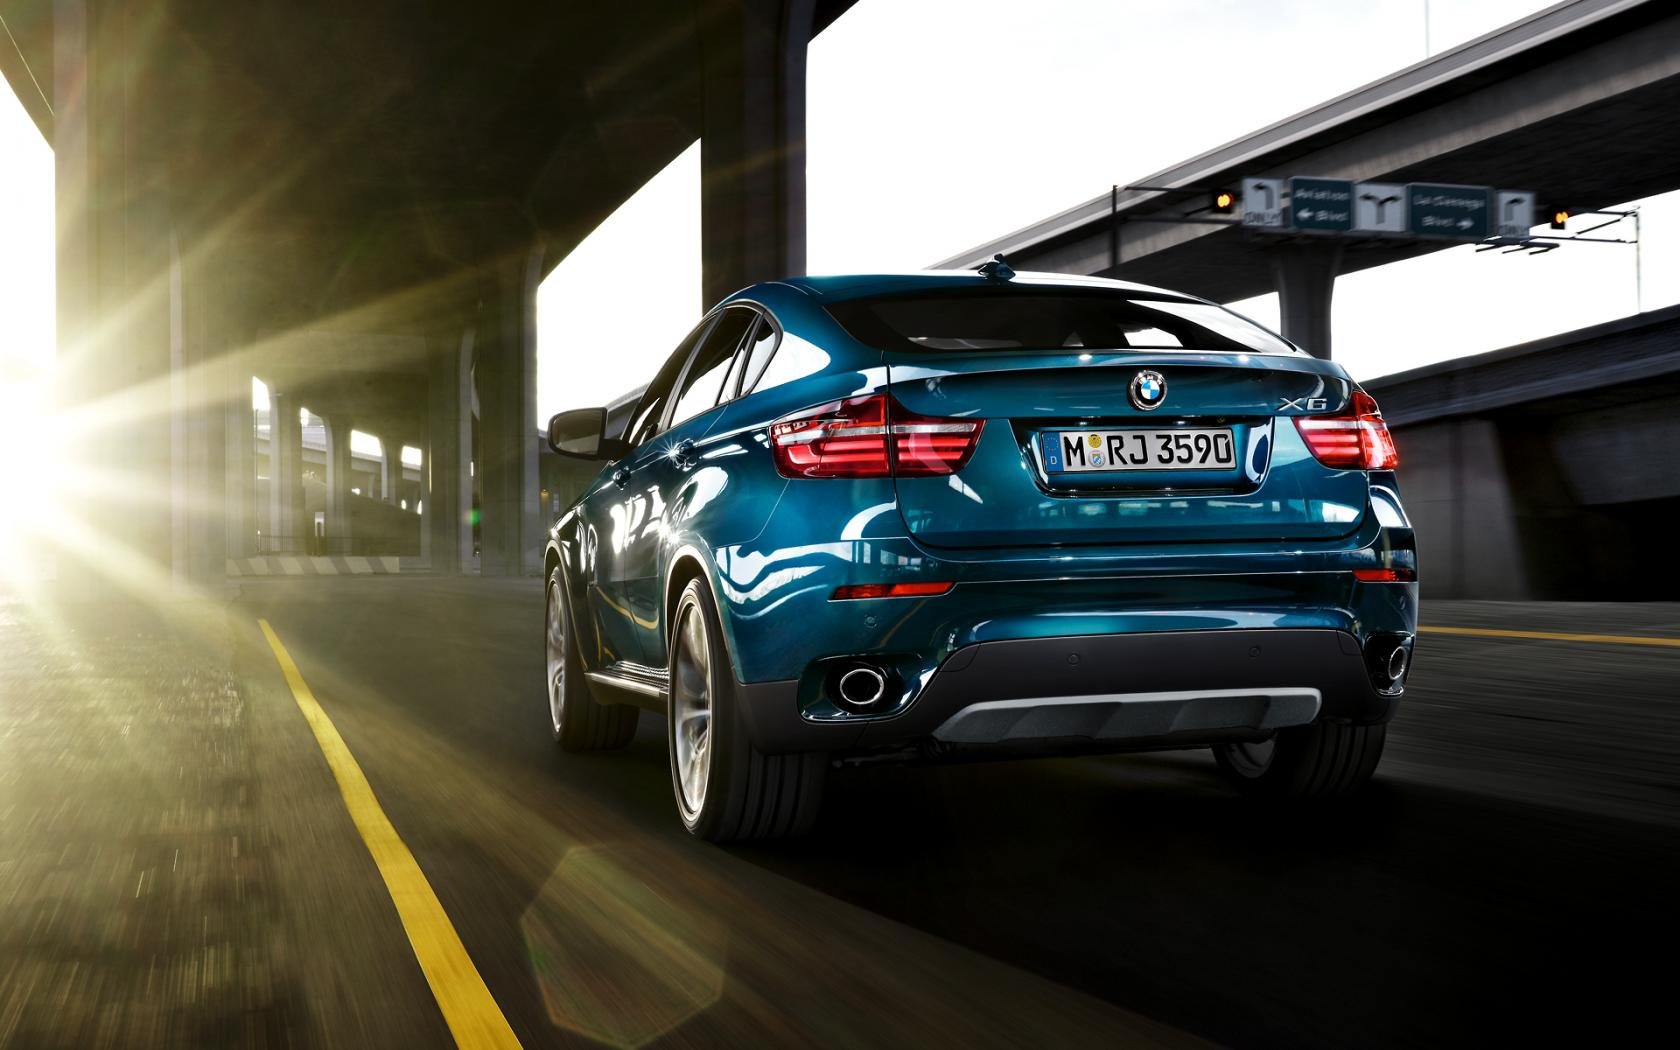 BMW-X6-E71_20170616-0133.jpeg